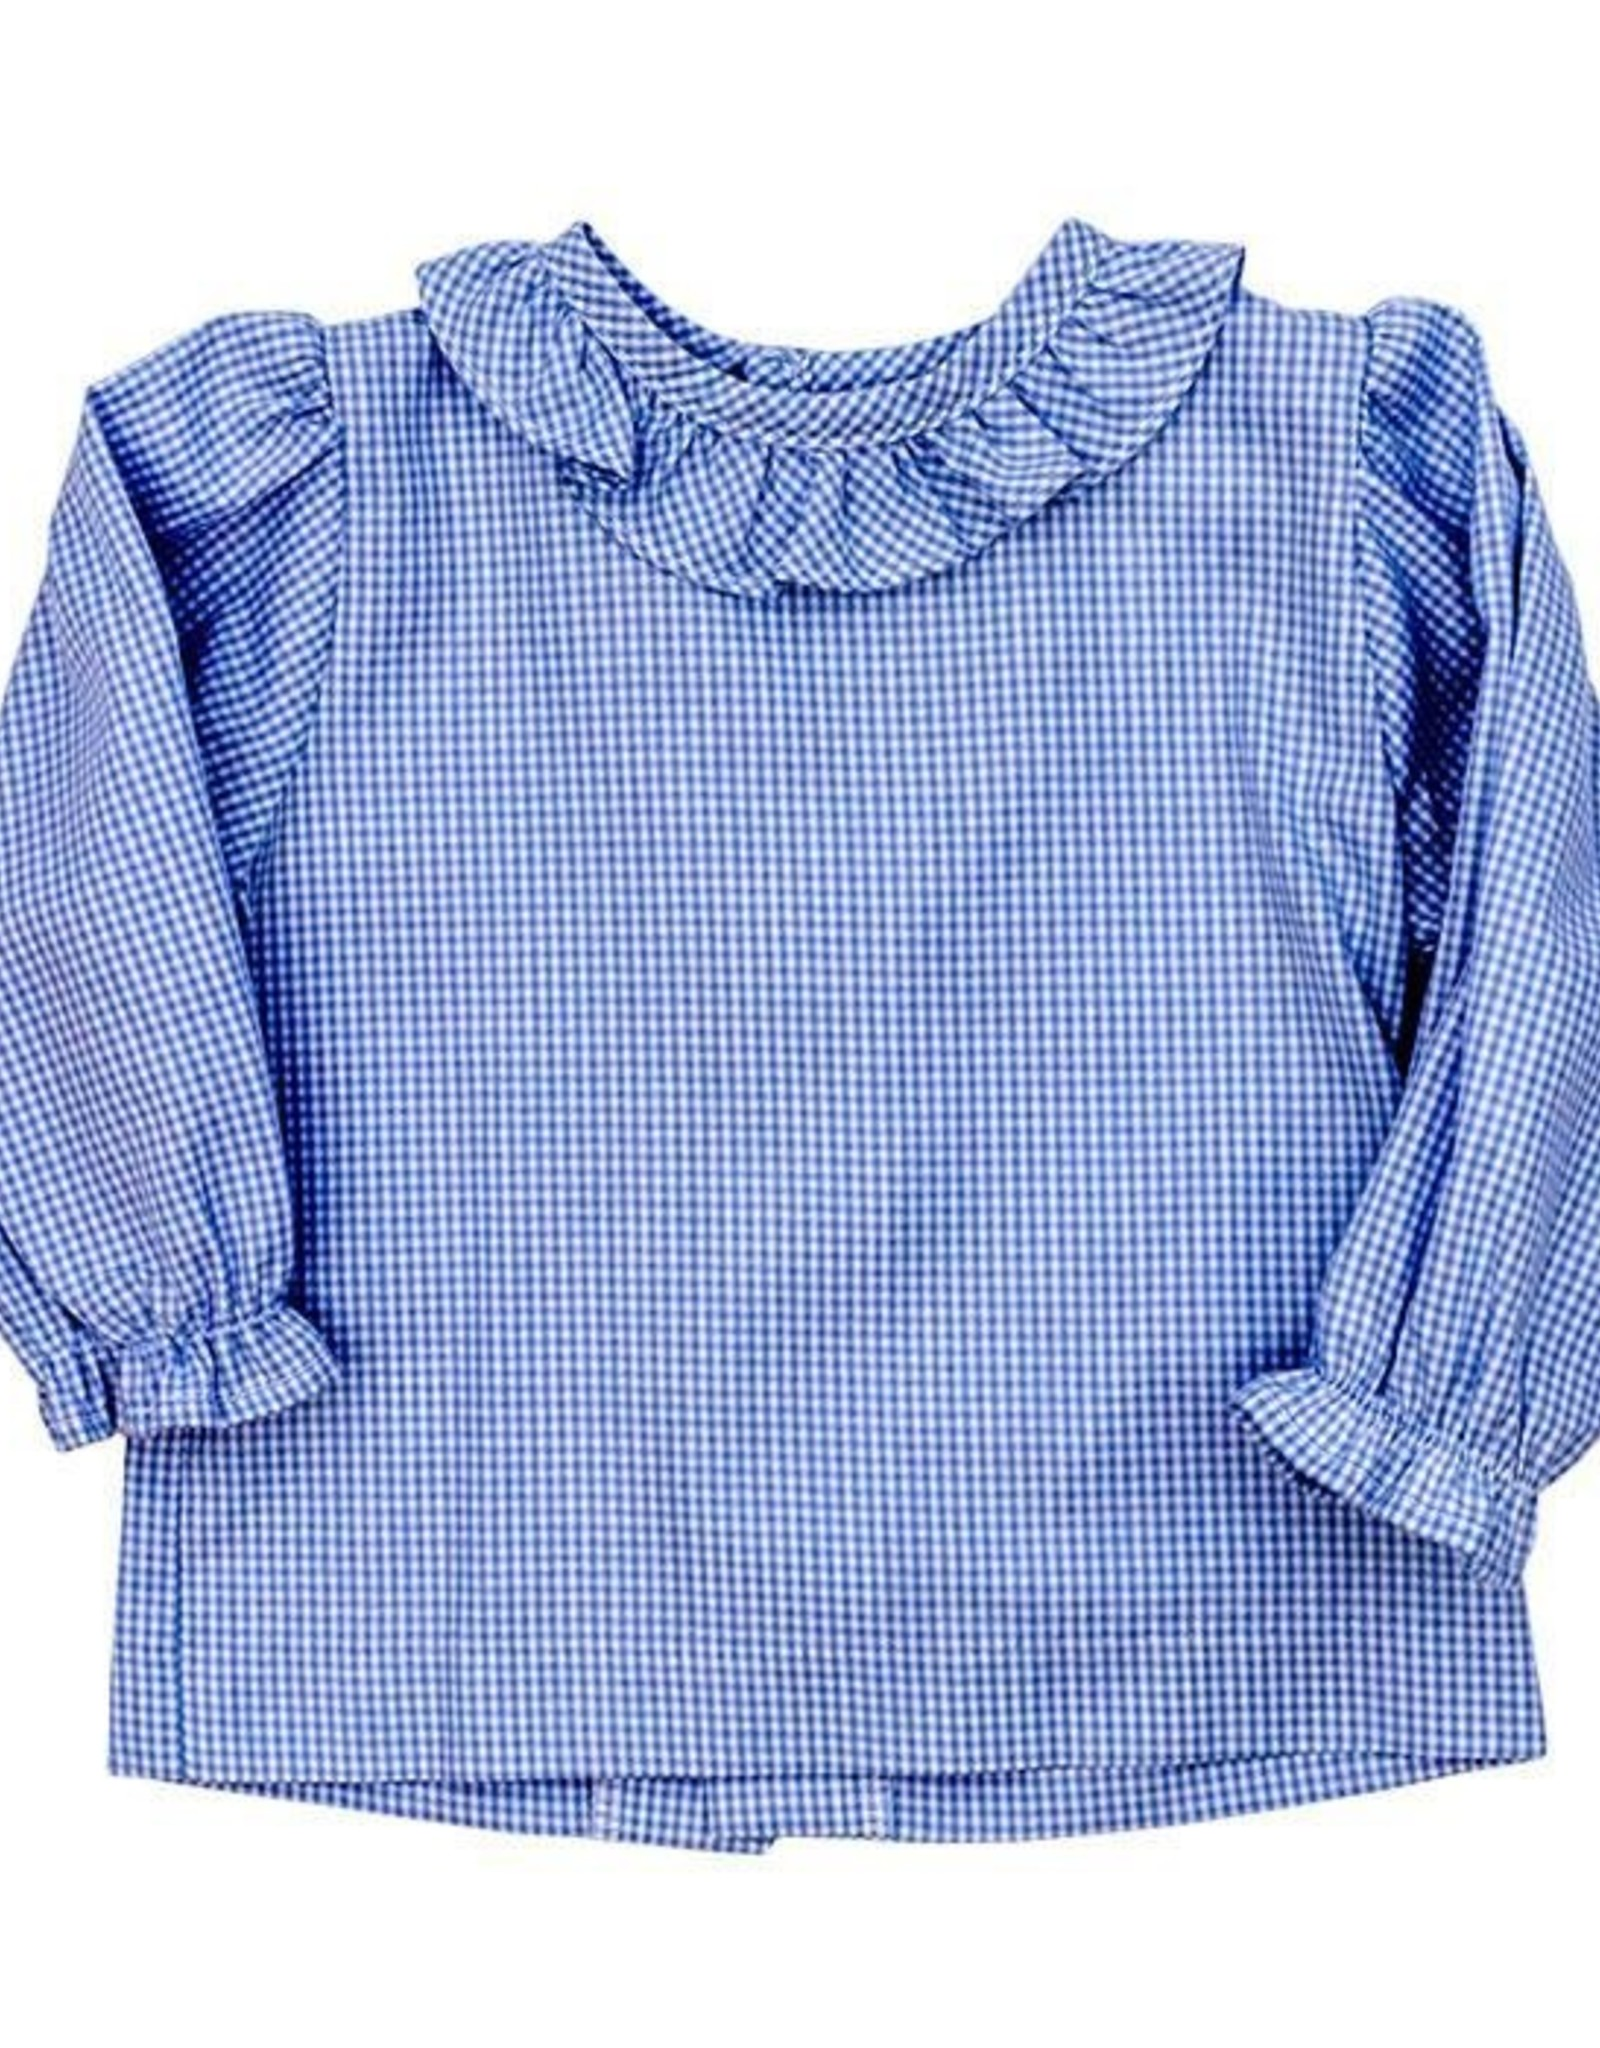 The Bailey Boys Light Blue Check Piped Girls Shirt w/ Ruffle